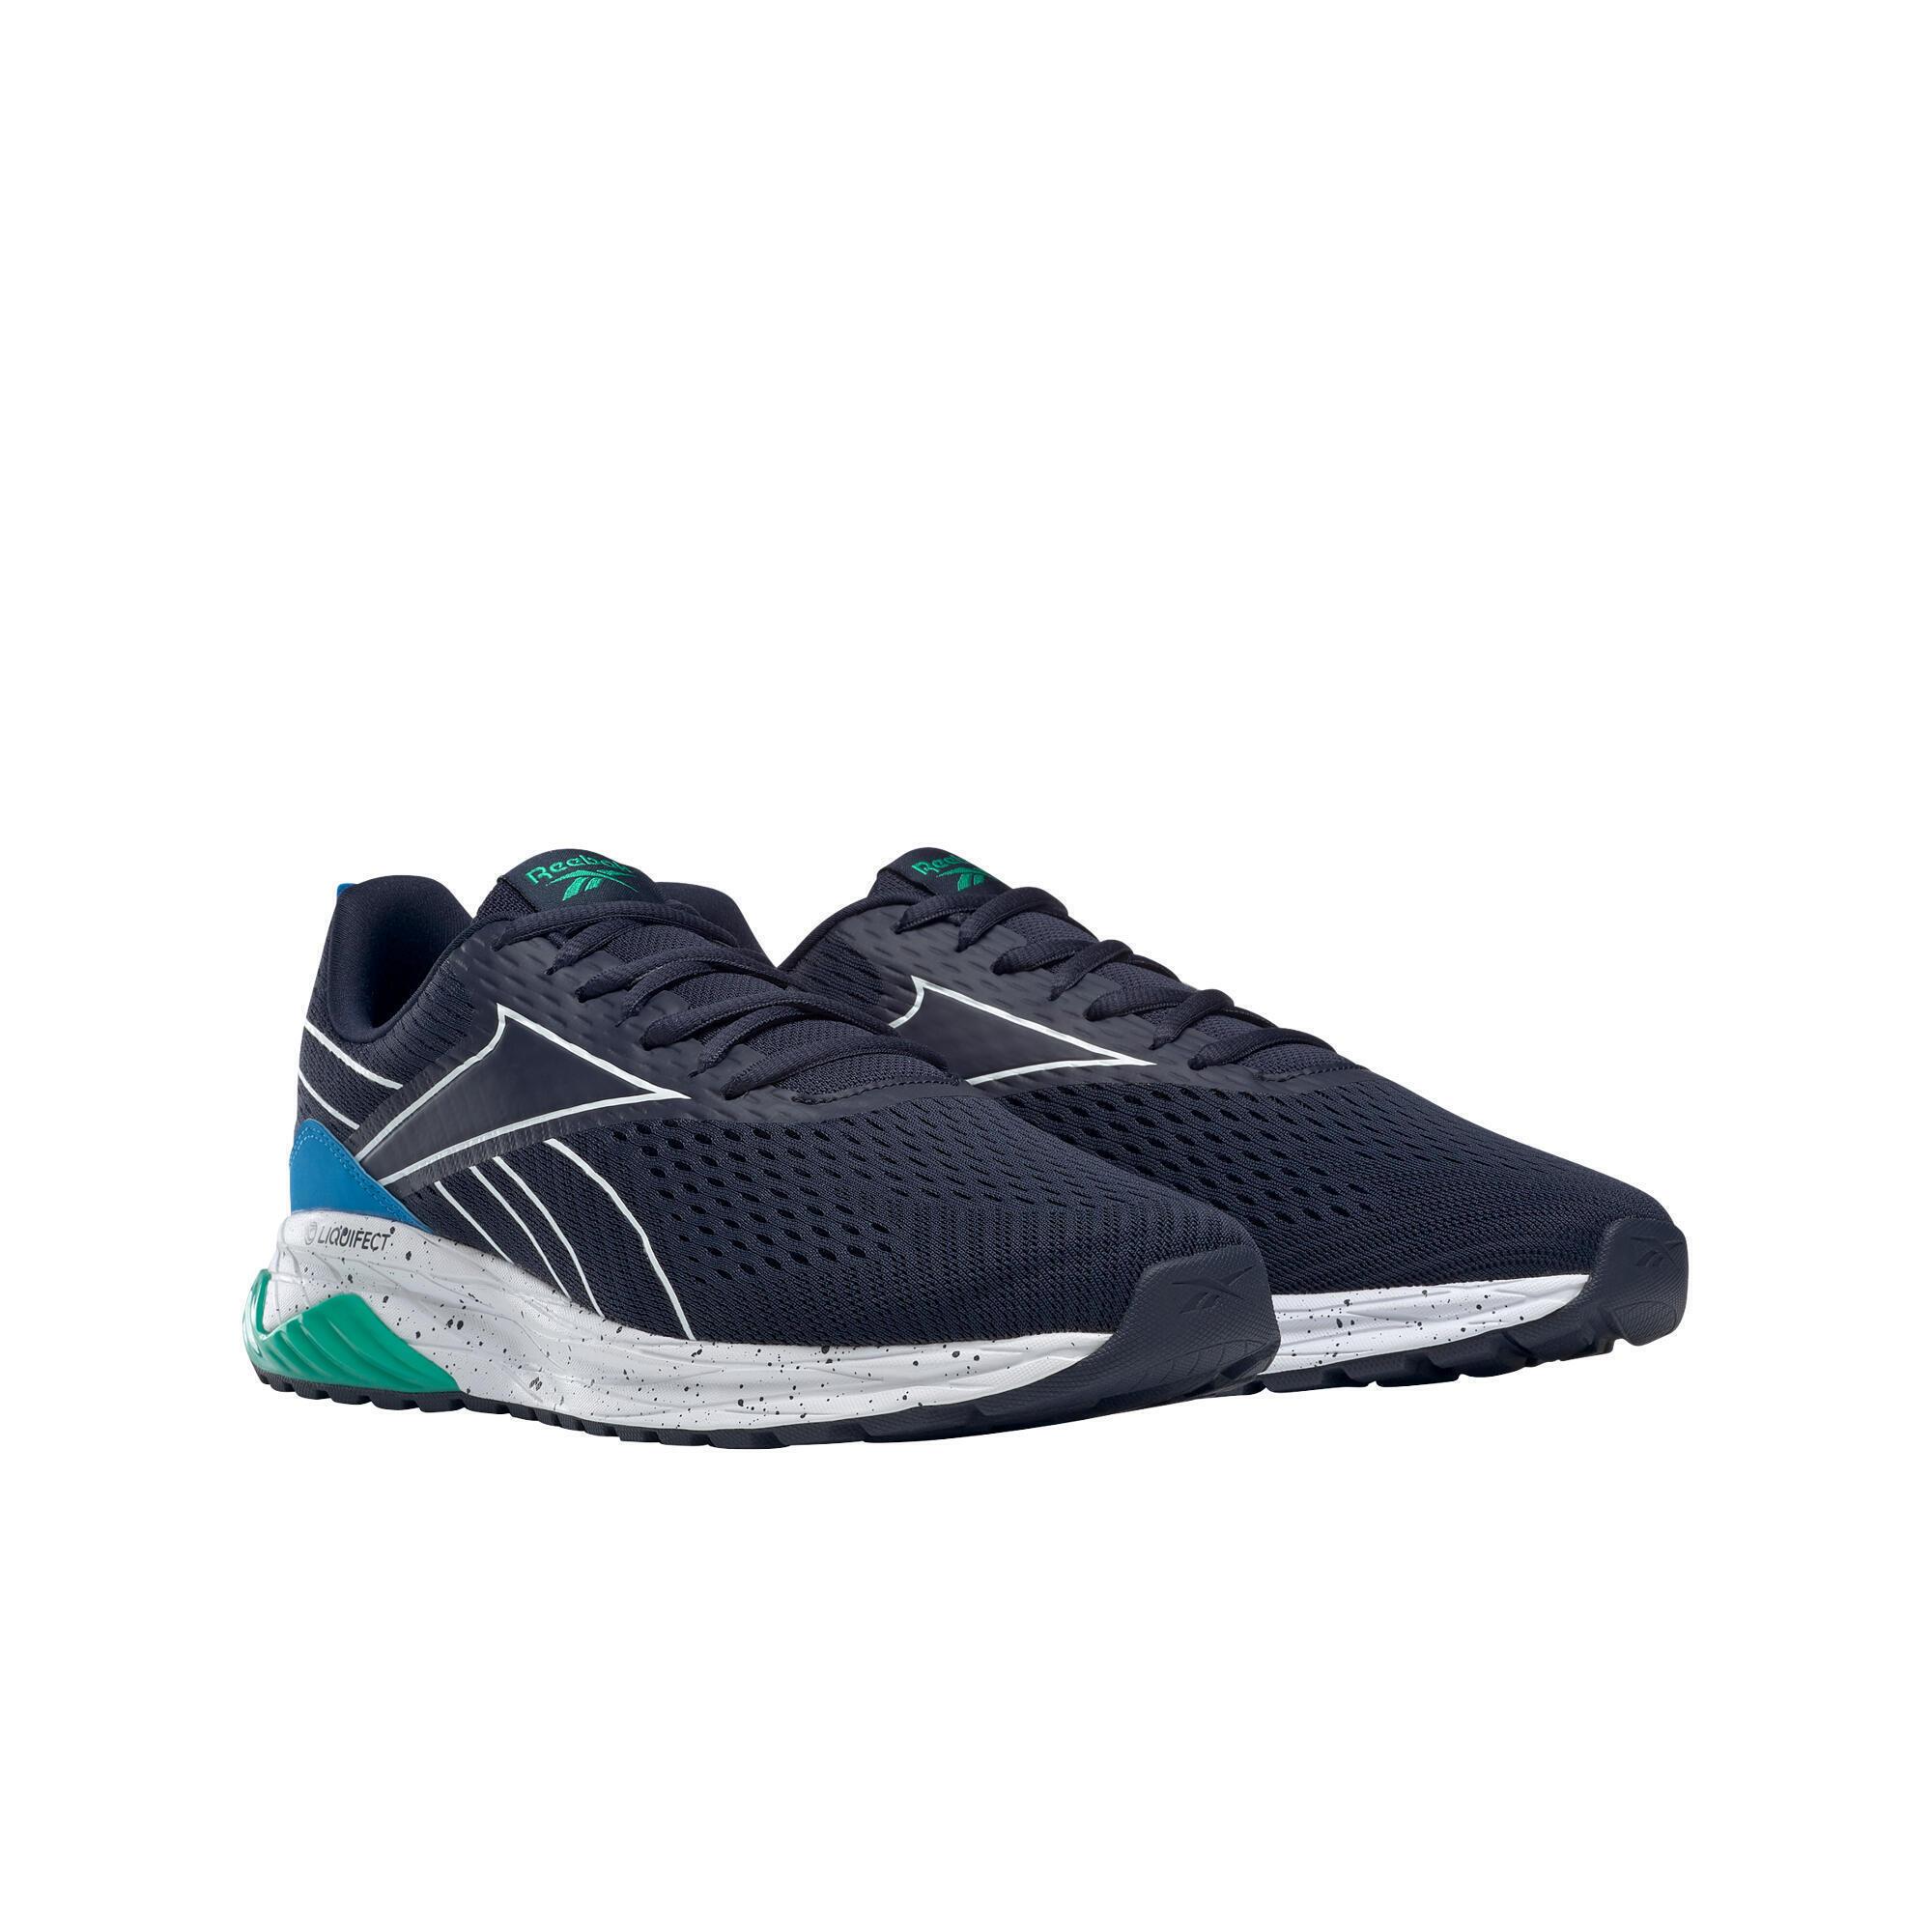 Reebok Homme liquifect 180 Sport Knit Fitness Chaussures De Course Baskets BHFO 5068